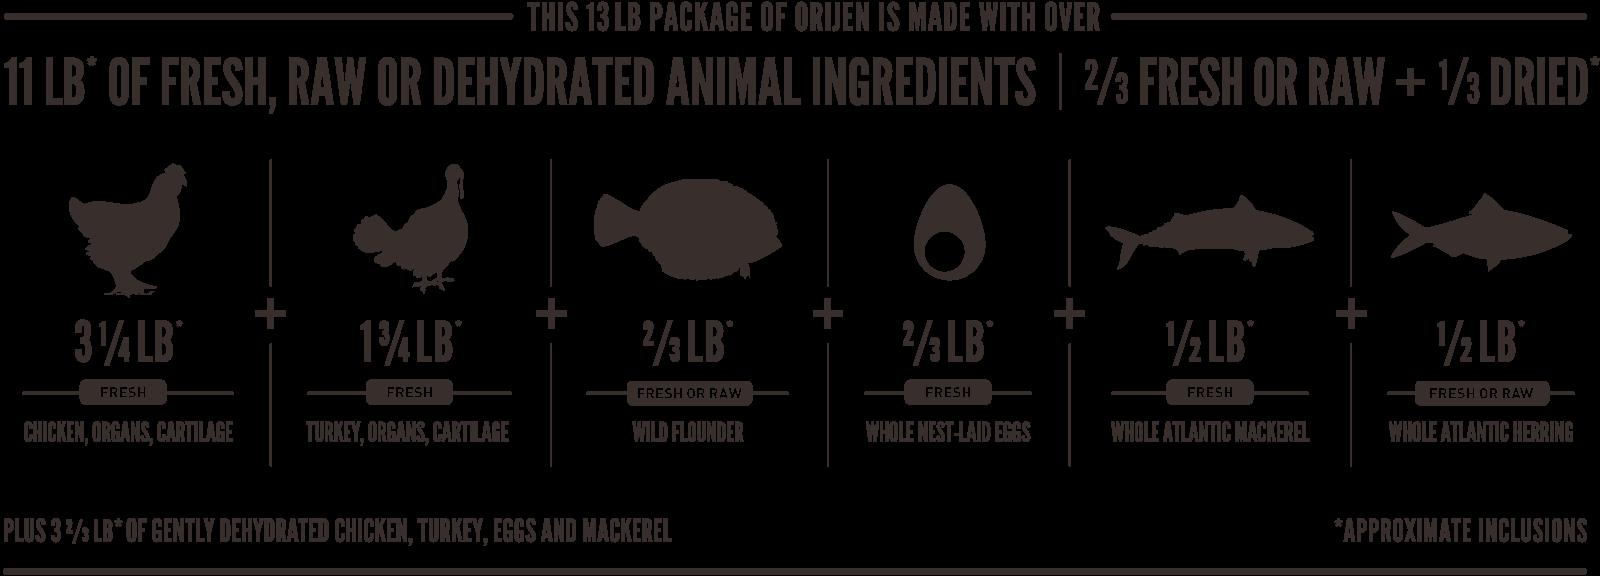 ORIJEN Original Meatmath Formula and Dog Food Ingredients